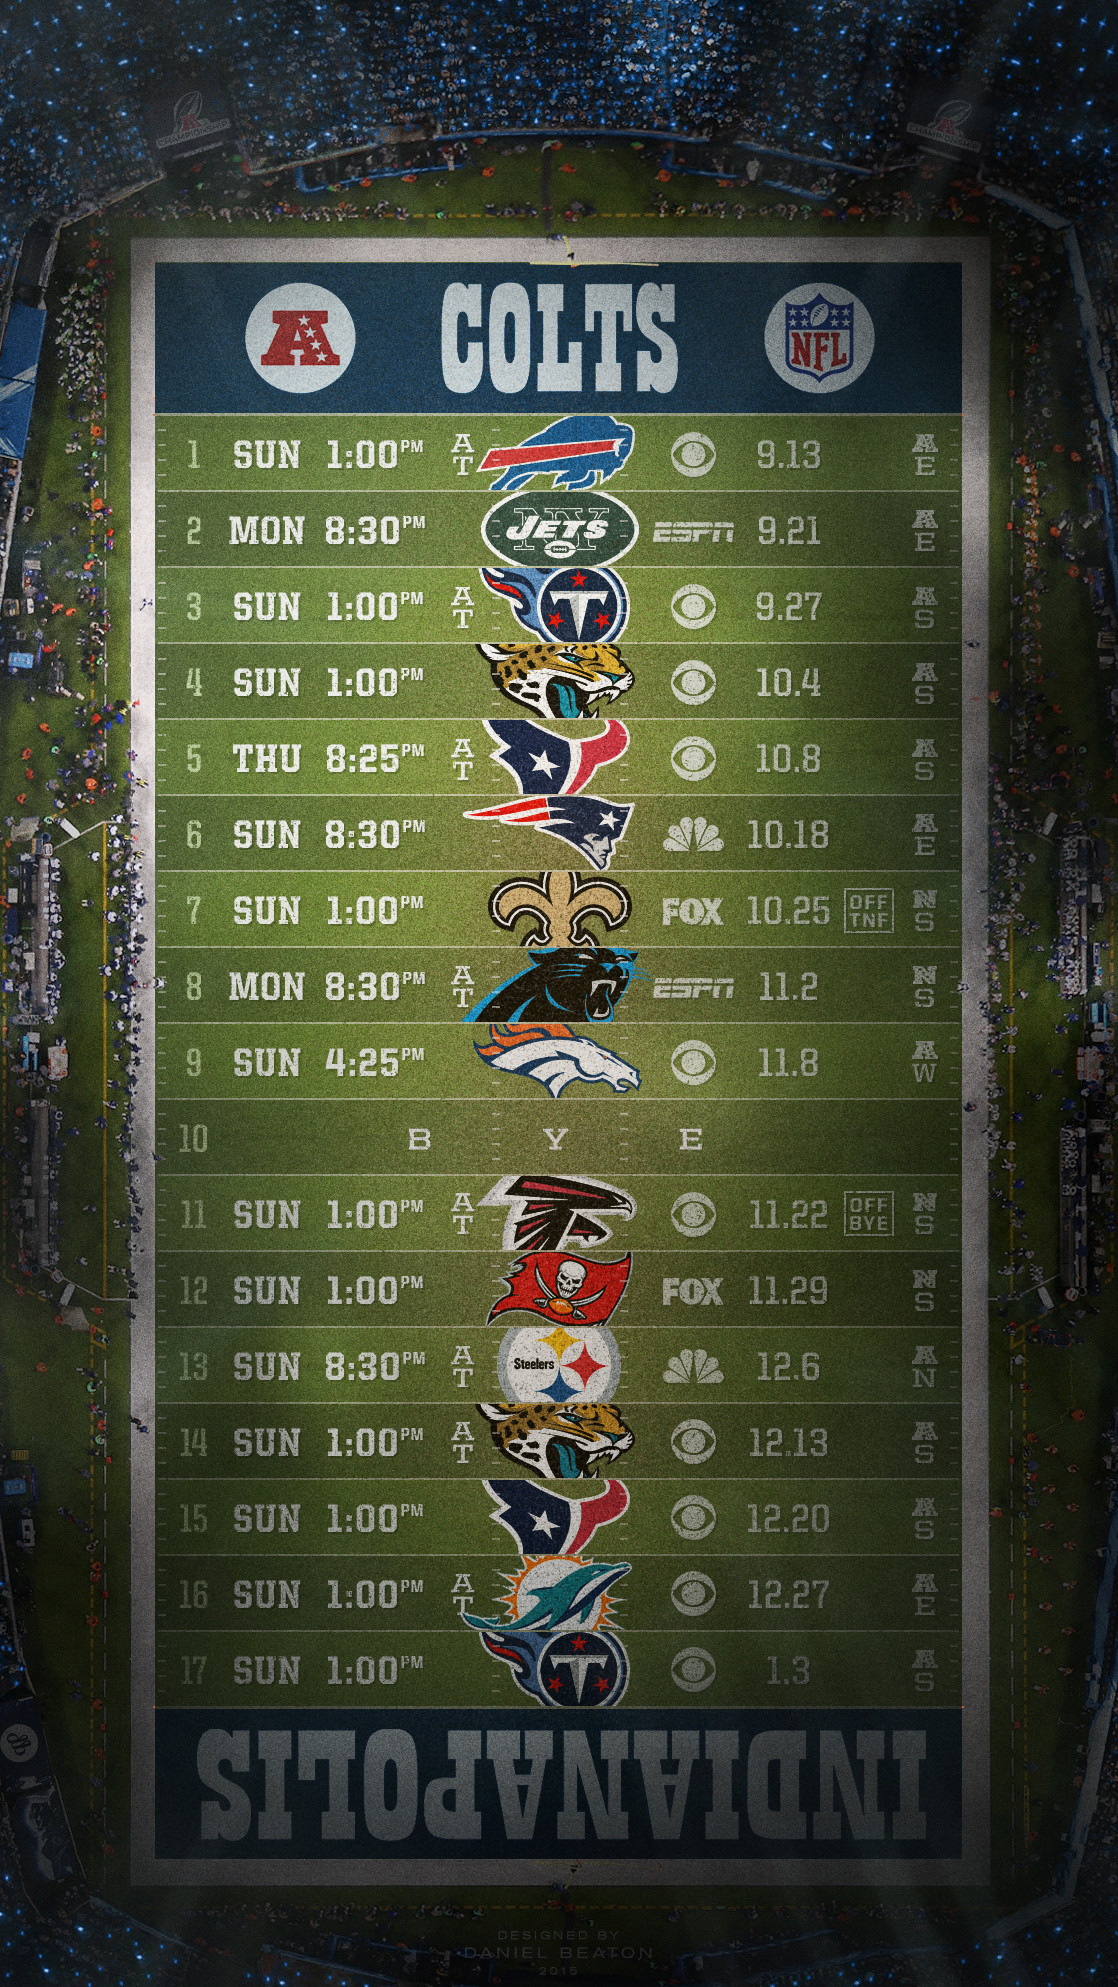 1920x1080 7 Indianapolis Colts Wallpaper HD7 600x338